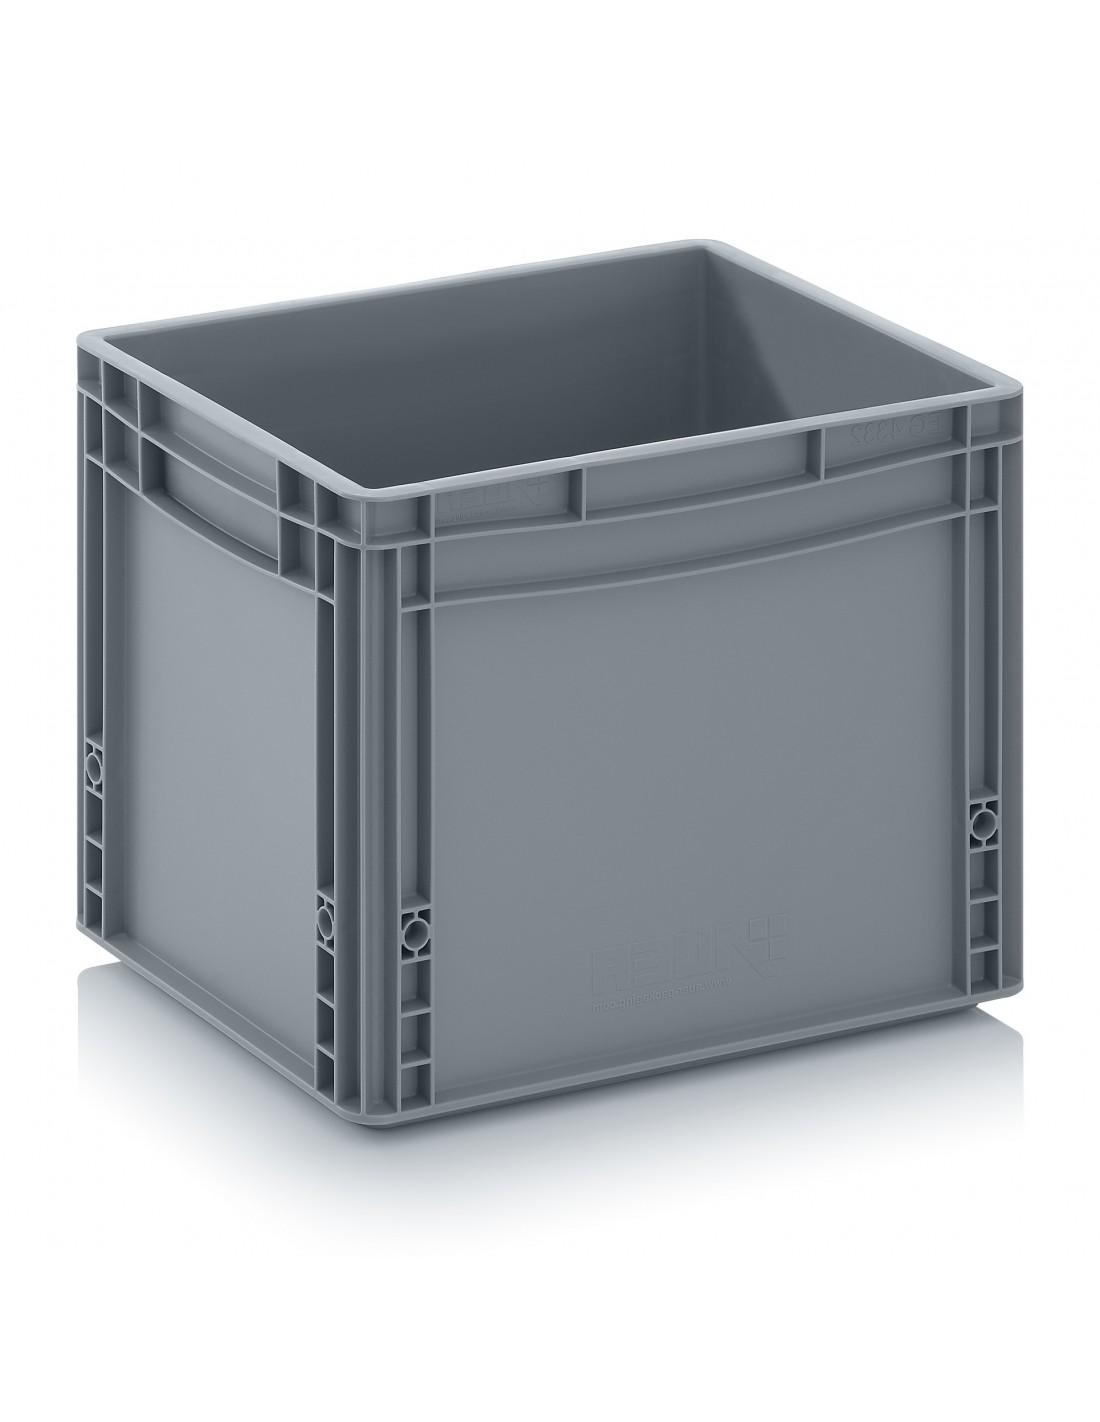 400 x 300 x 320 mm, Eurobehälter